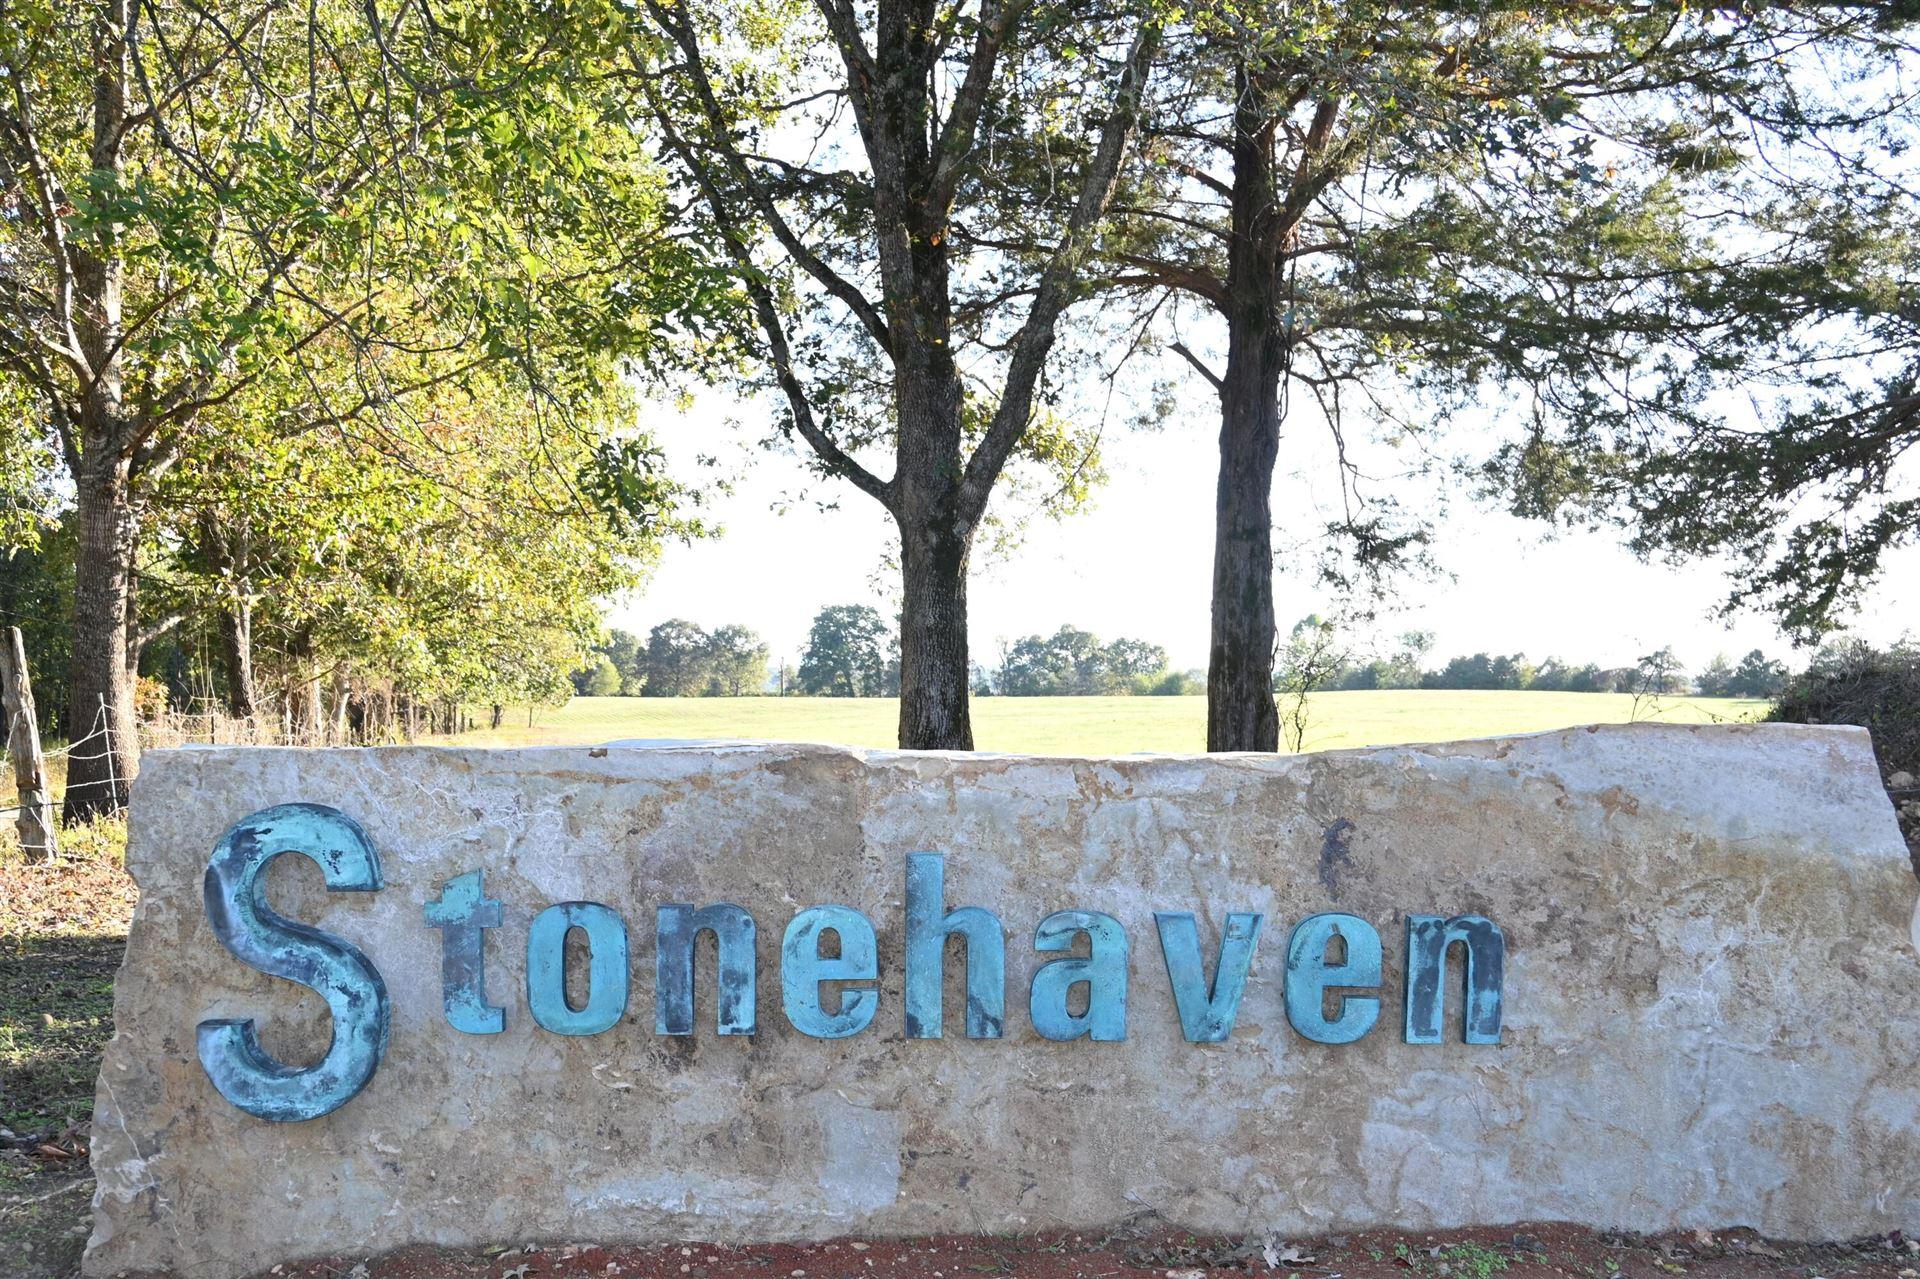 Photo of Lot 10 Stonehaven Way, Shell Knob, MO 65747 (MLS # 60203685)